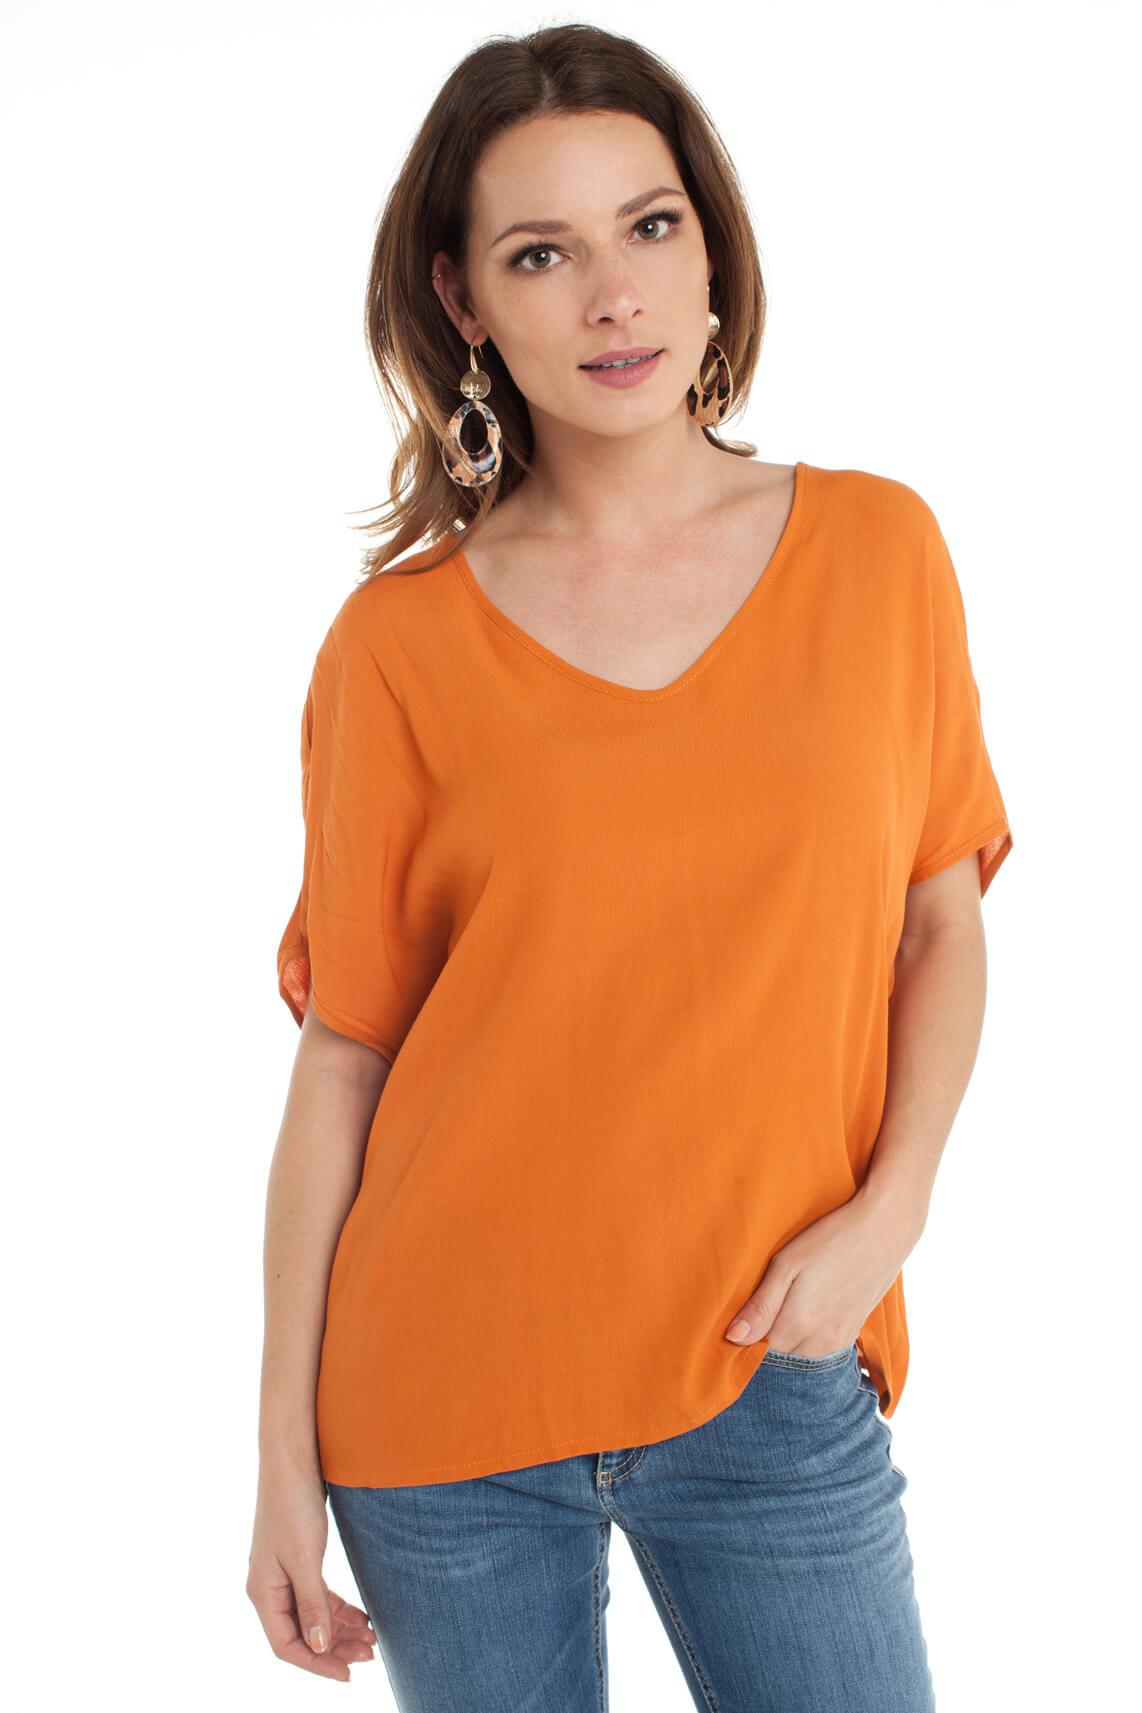 La Fée Maraboutée Dames Wijde blouse Oranje